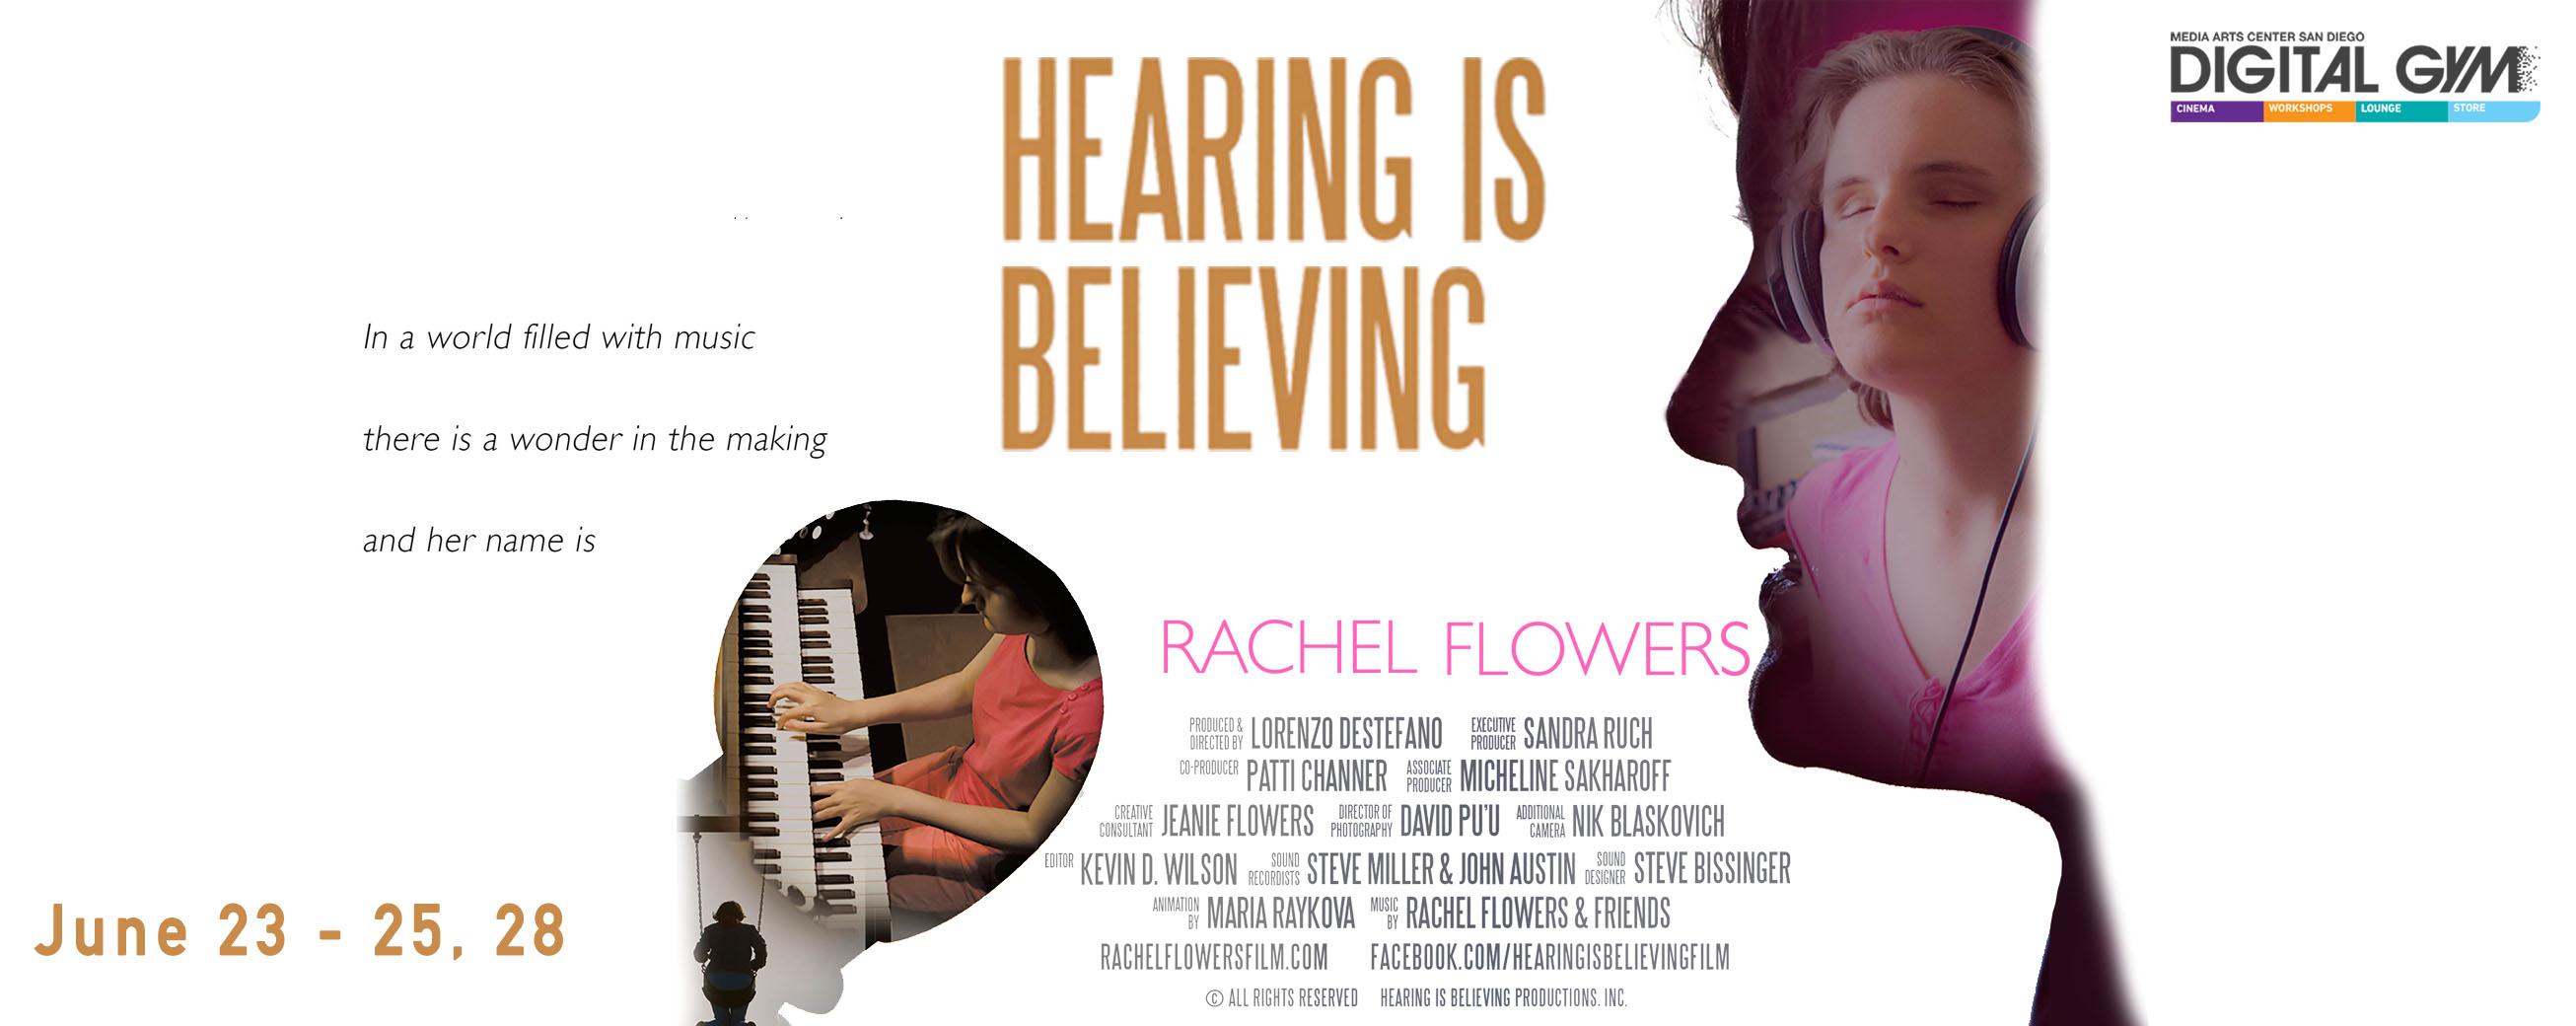 Hearing is Believing – inspiring documentary on musical prodigy Rachel Flowers (June 23-25, 28)